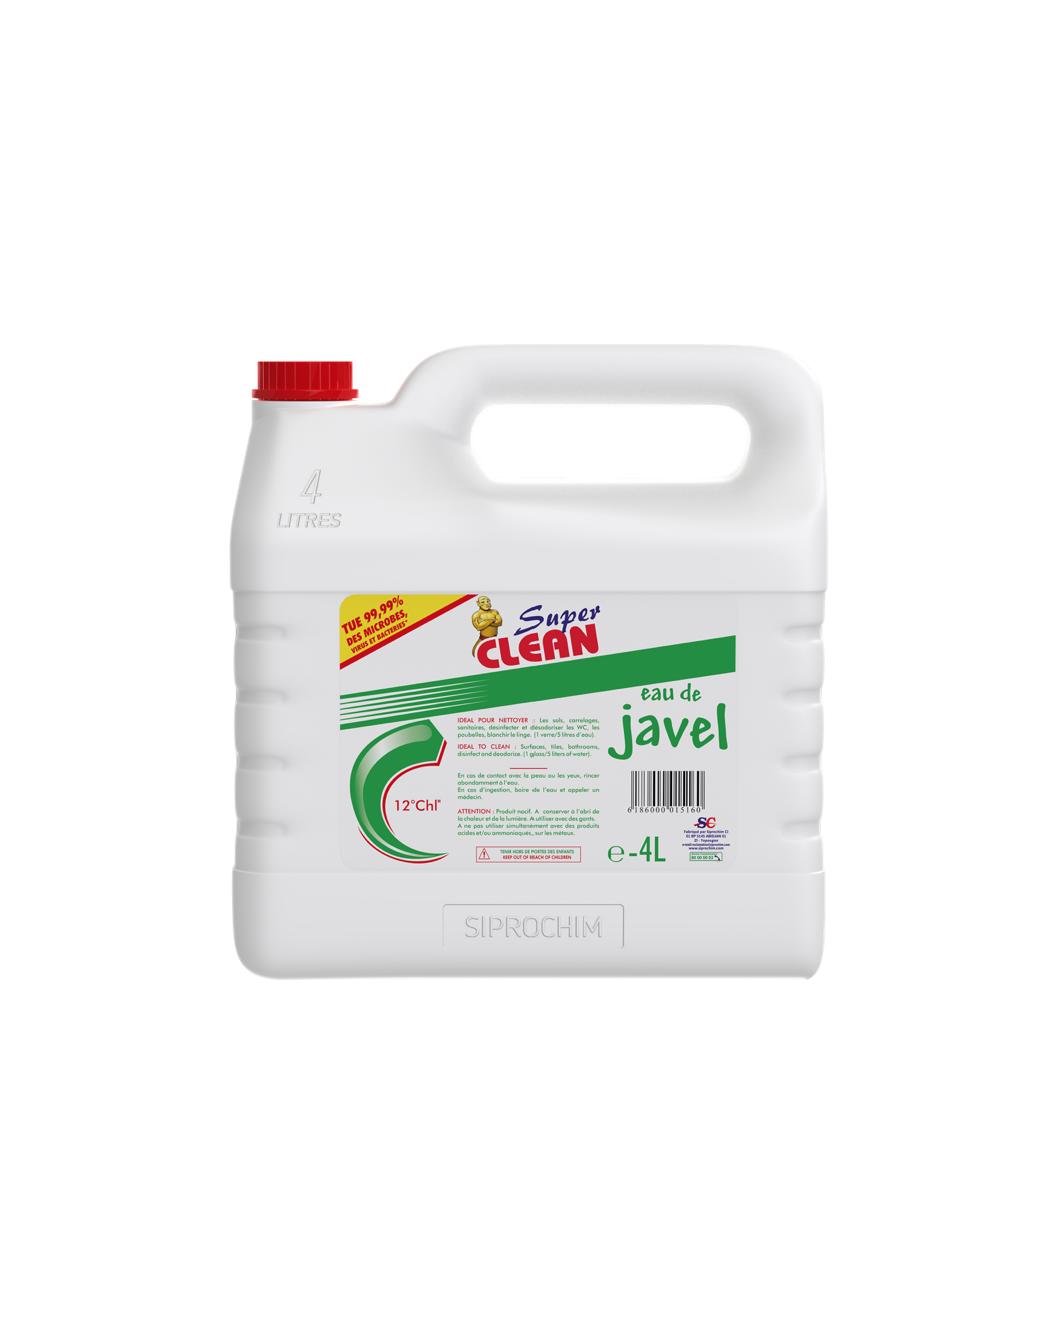 SUPER CLEAN_Eau de Javel 12° 4L